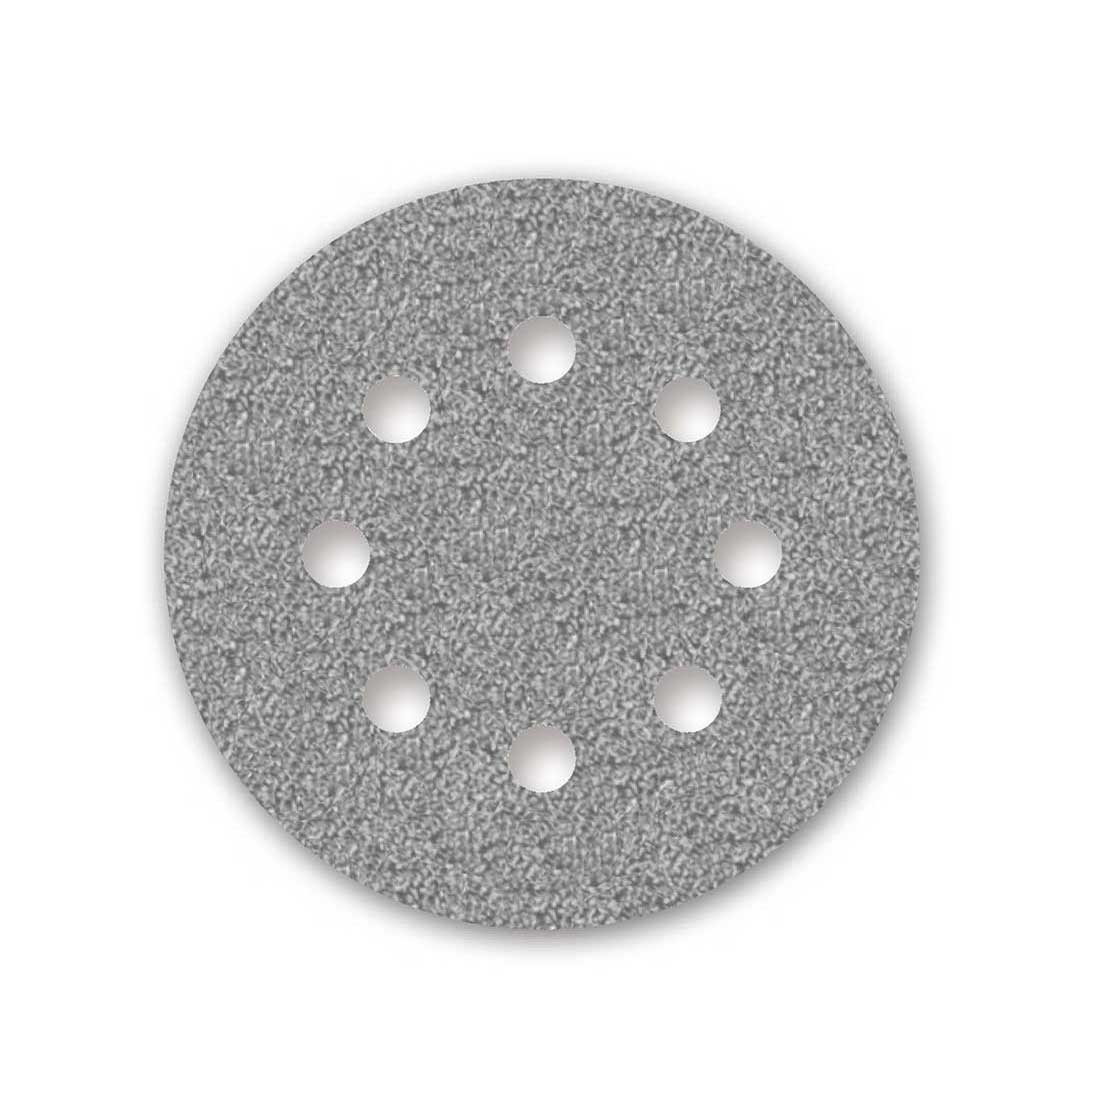 50 Dischi abrasivi autoadesivi MioTools per levigatrice roto orbitale /Ø 125 mm Grana 320-8 fori